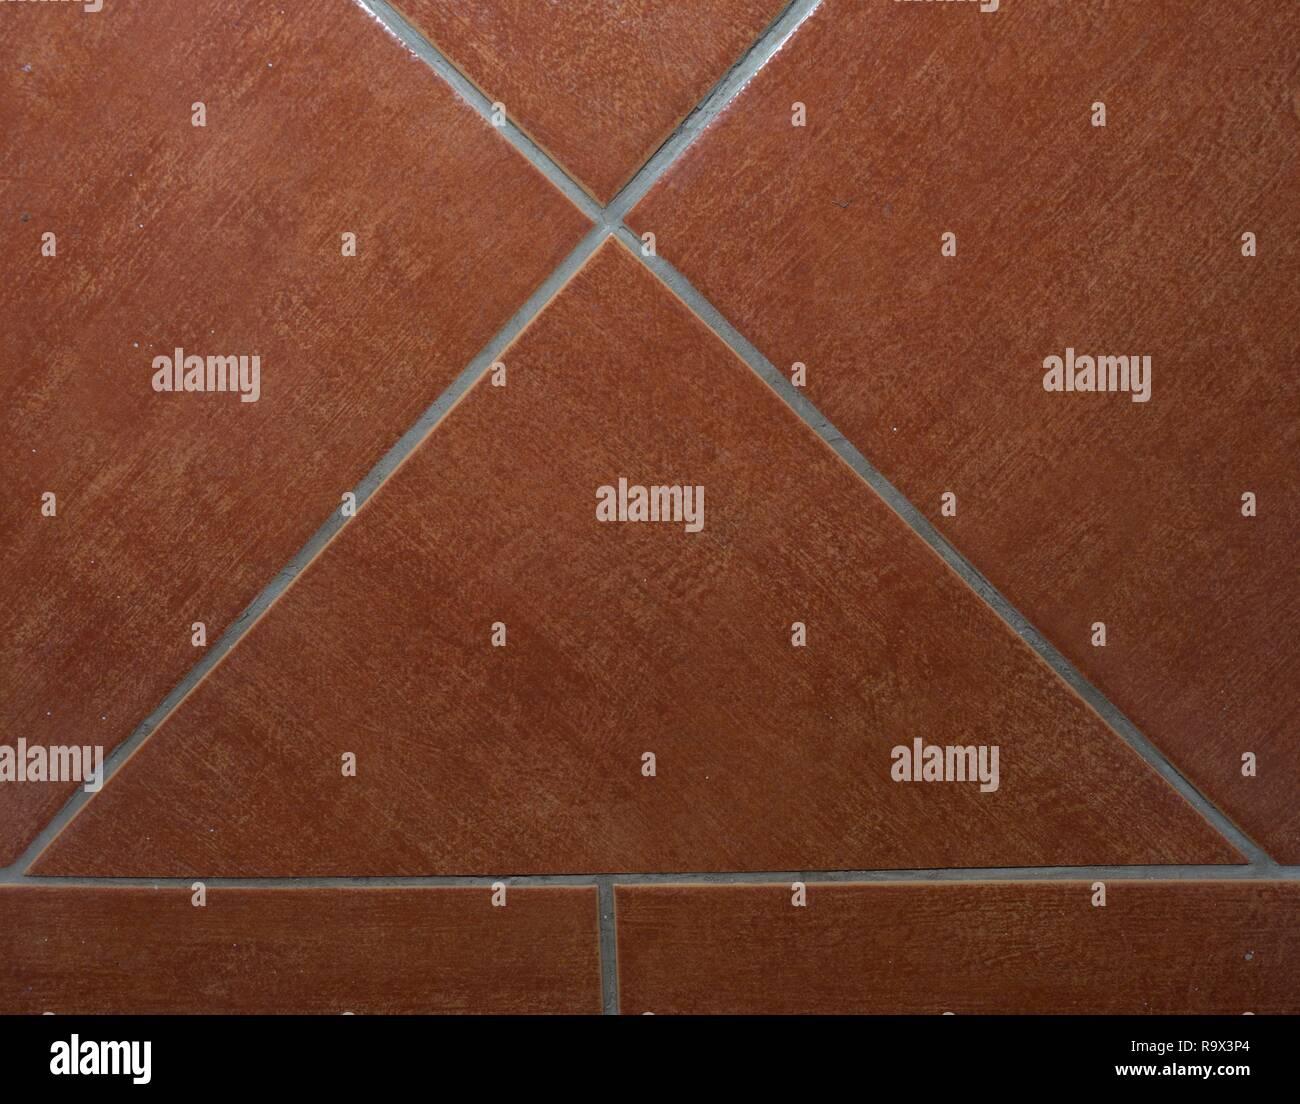 Custom tile bathroom backsplash wall with white  chinks between tiles. Stock Photo